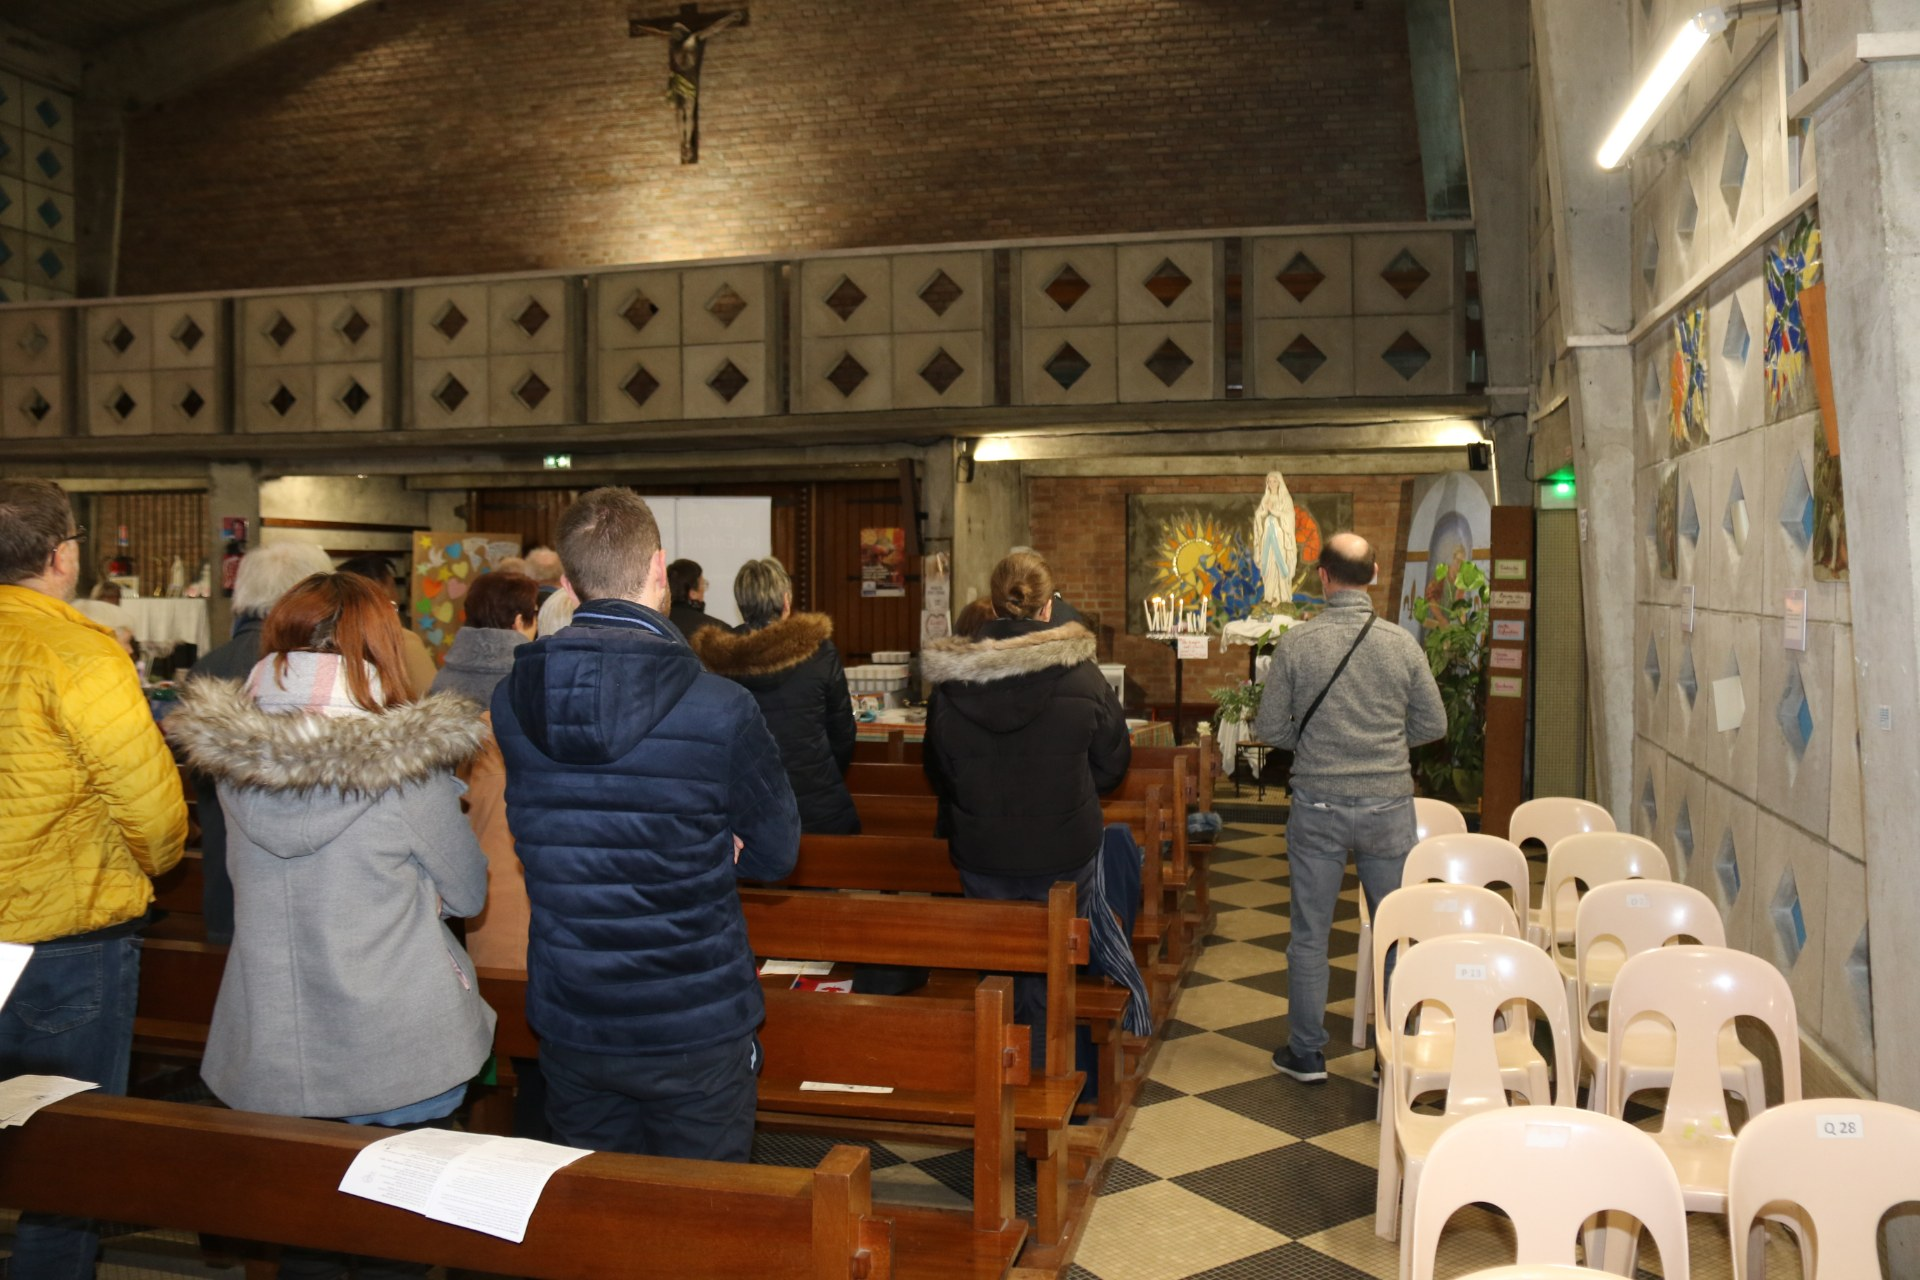 Messe des Nations 92